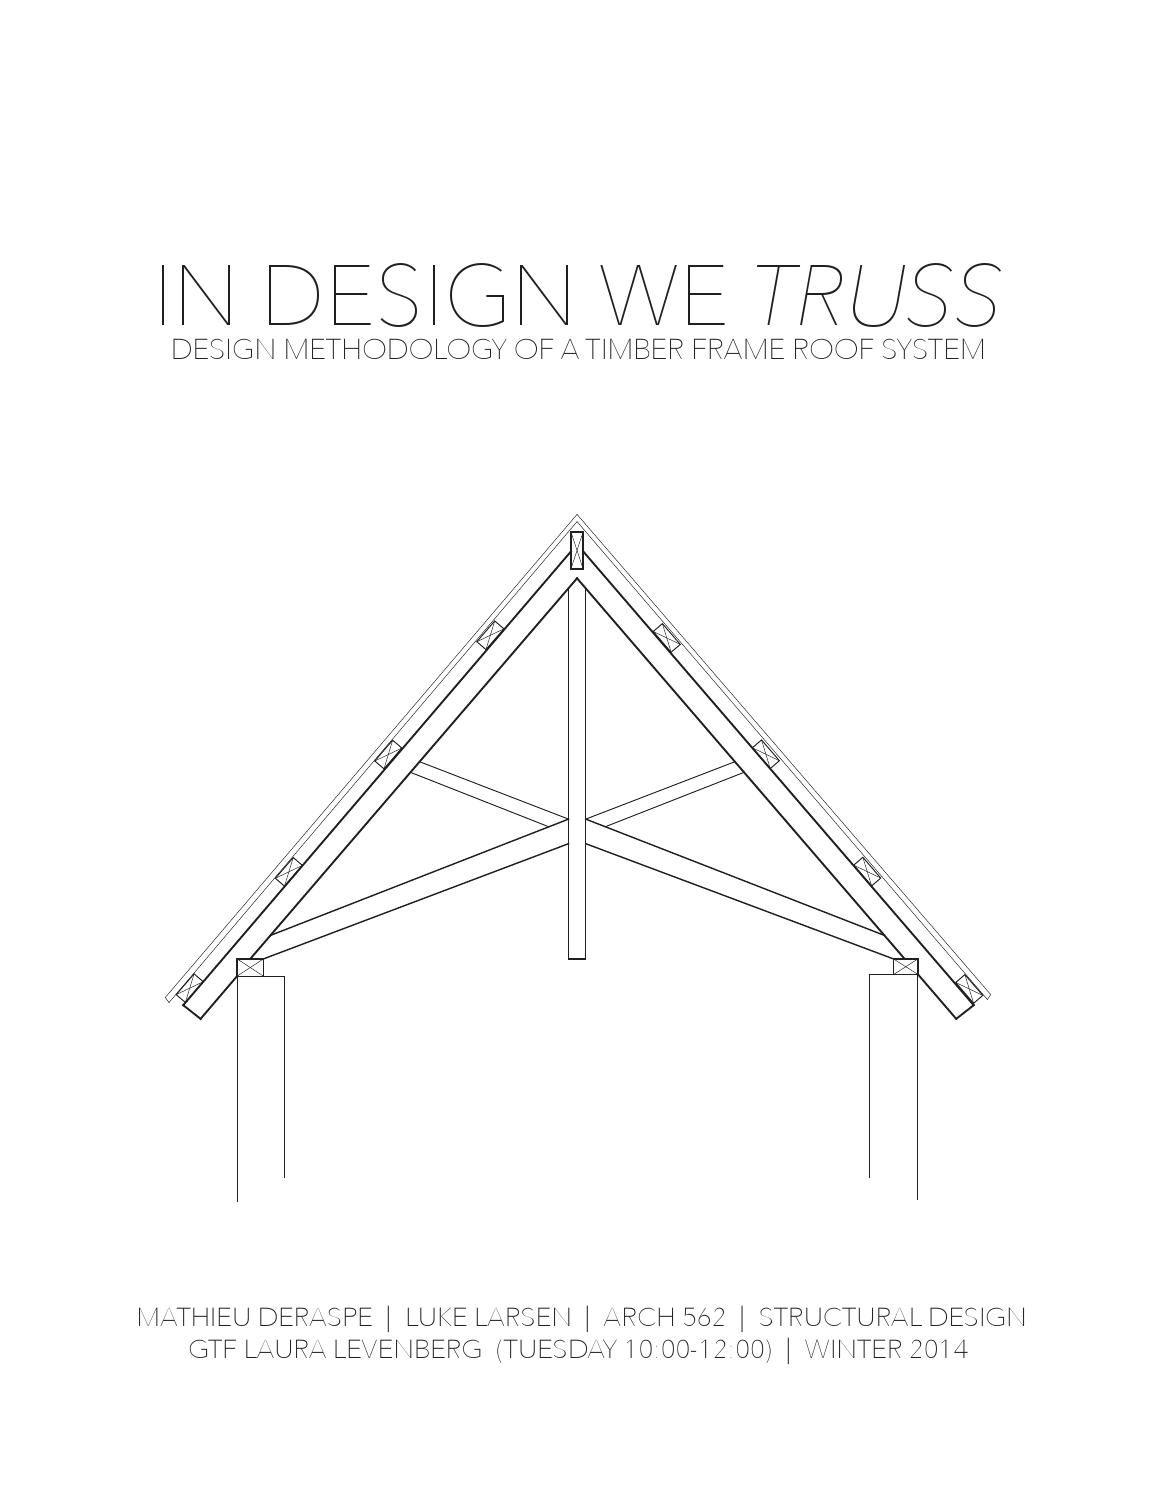 Structural Design Timber Frame Truss System